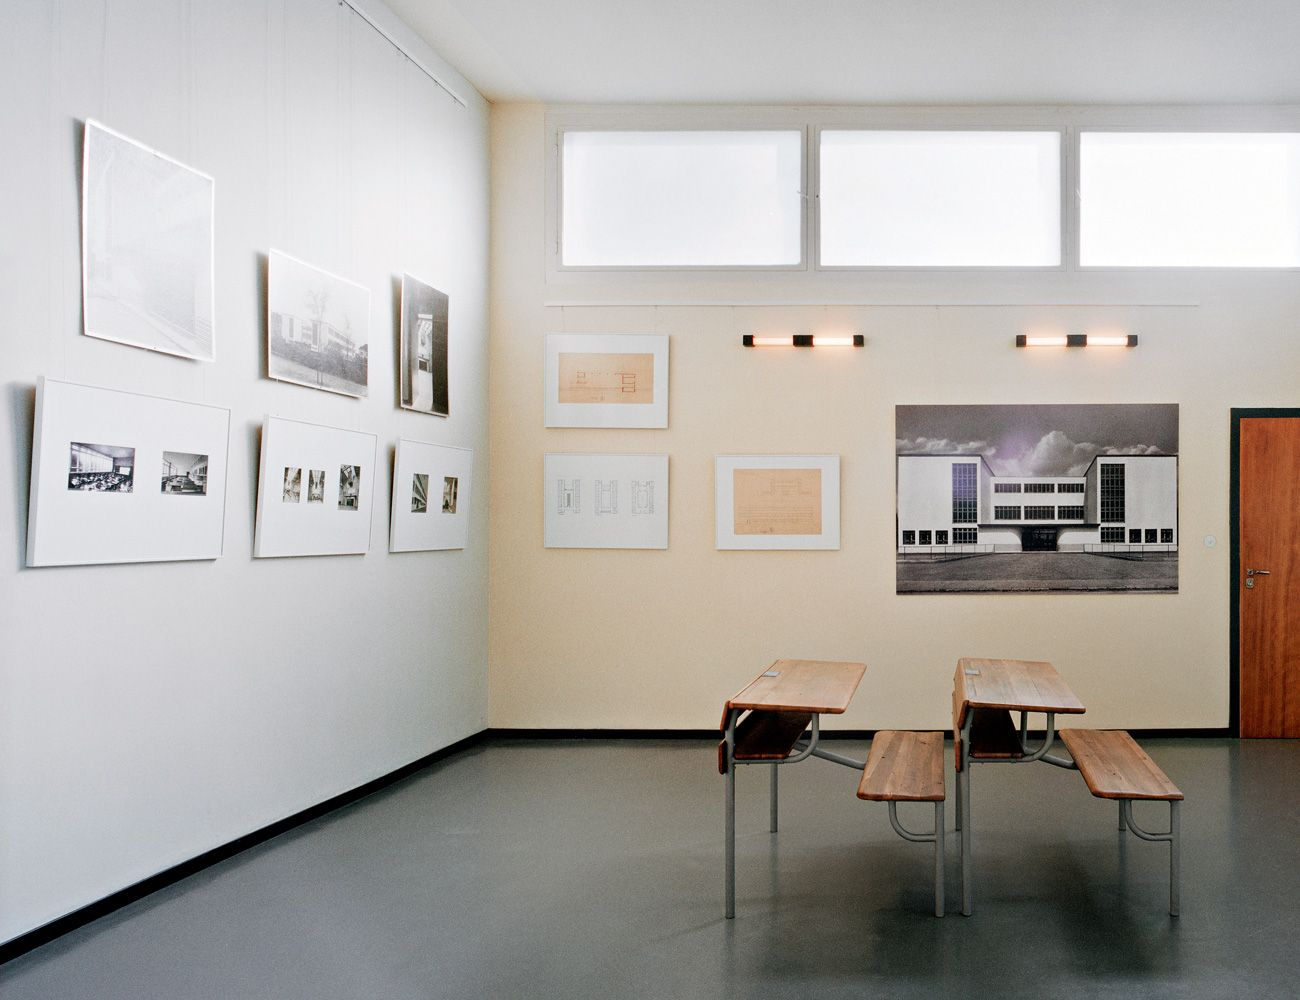 dlw flooring referenzen musterhaus am horn in weimar barbara pinterest. Black Bedroom Furniture Sets. Home Design Ideas